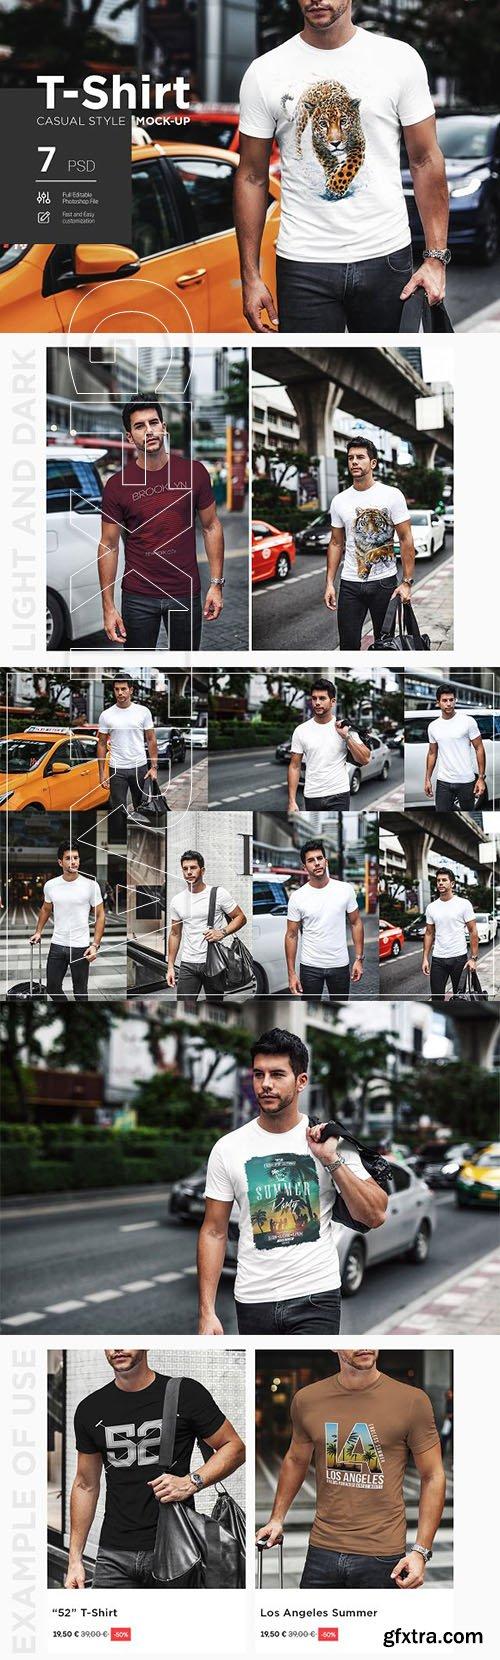 CreativeMarket - T-Shirt Mock-Up Casual Style 2978027